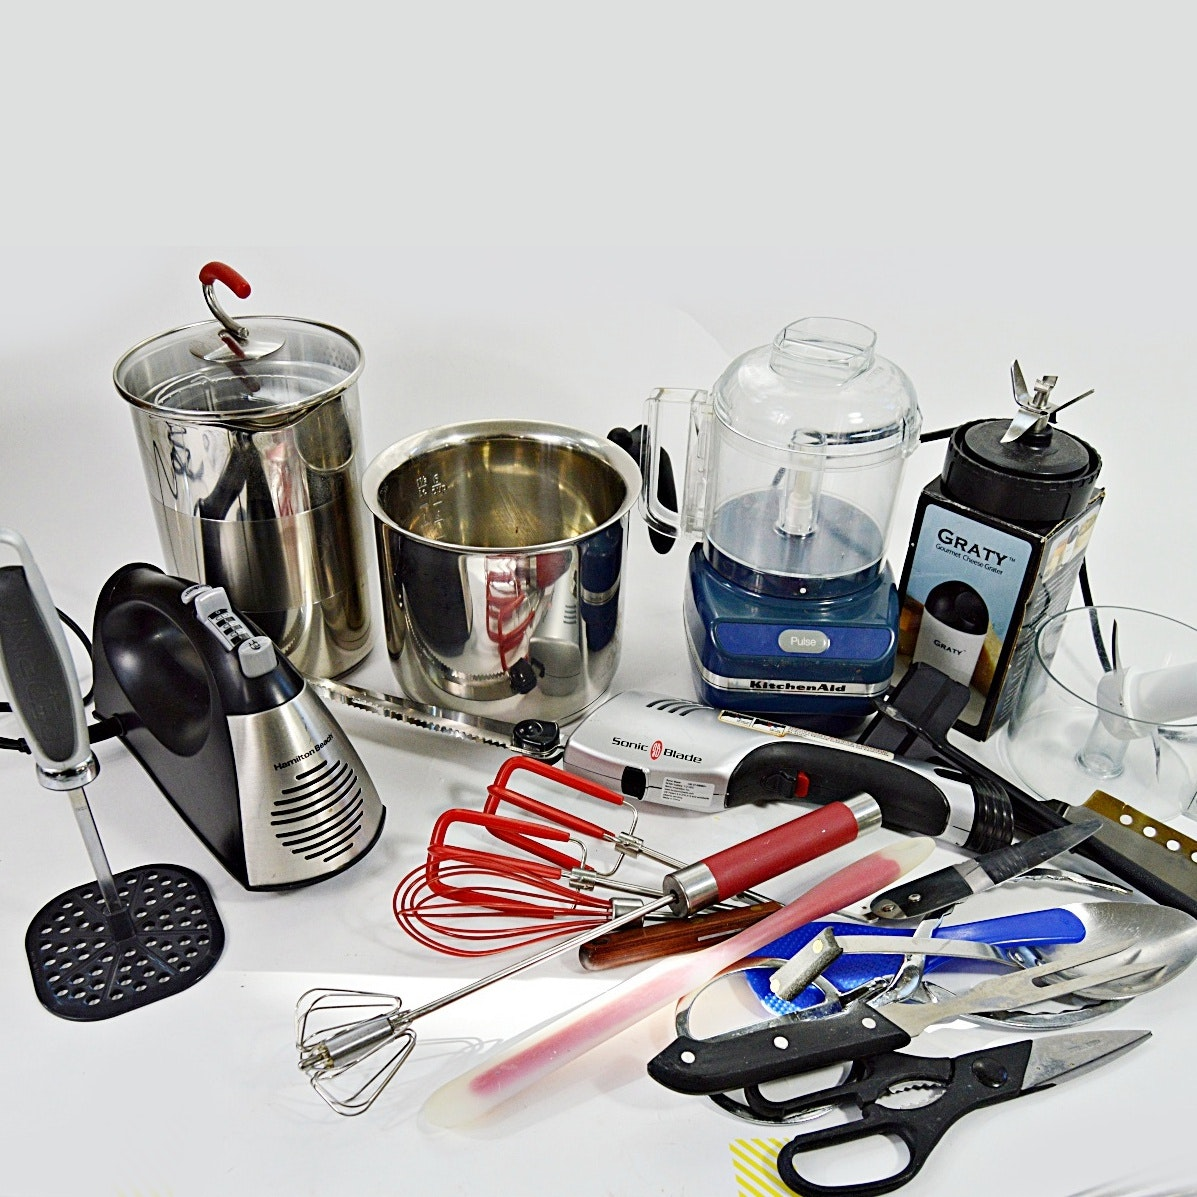 Kitchen Gadgets, Appliances And Utensils